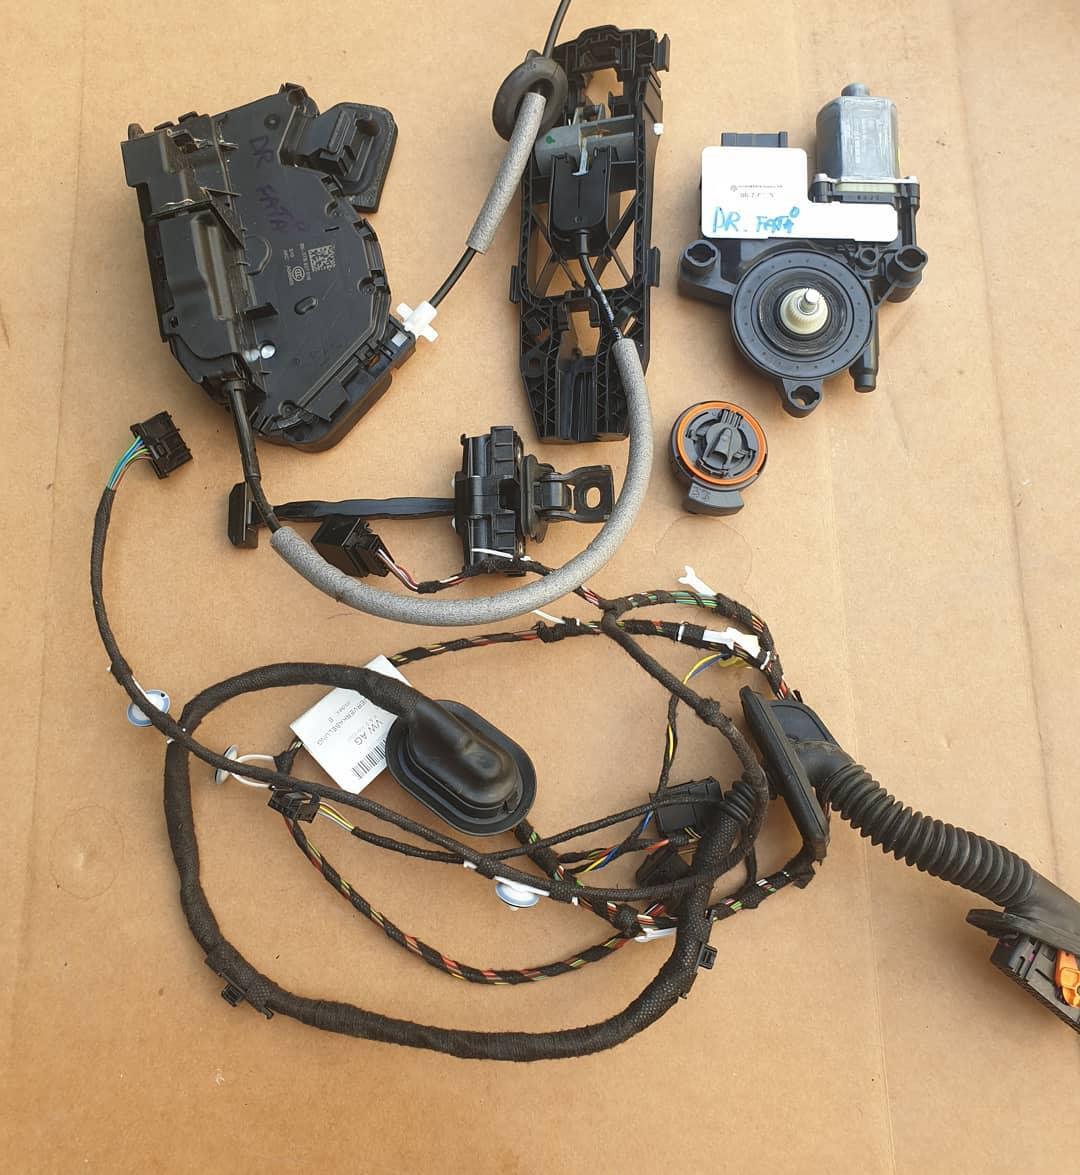 VW Polo Vl Macara geam, instalatie, motoras geam, balama, incuietoare, broasca, senzor impact.